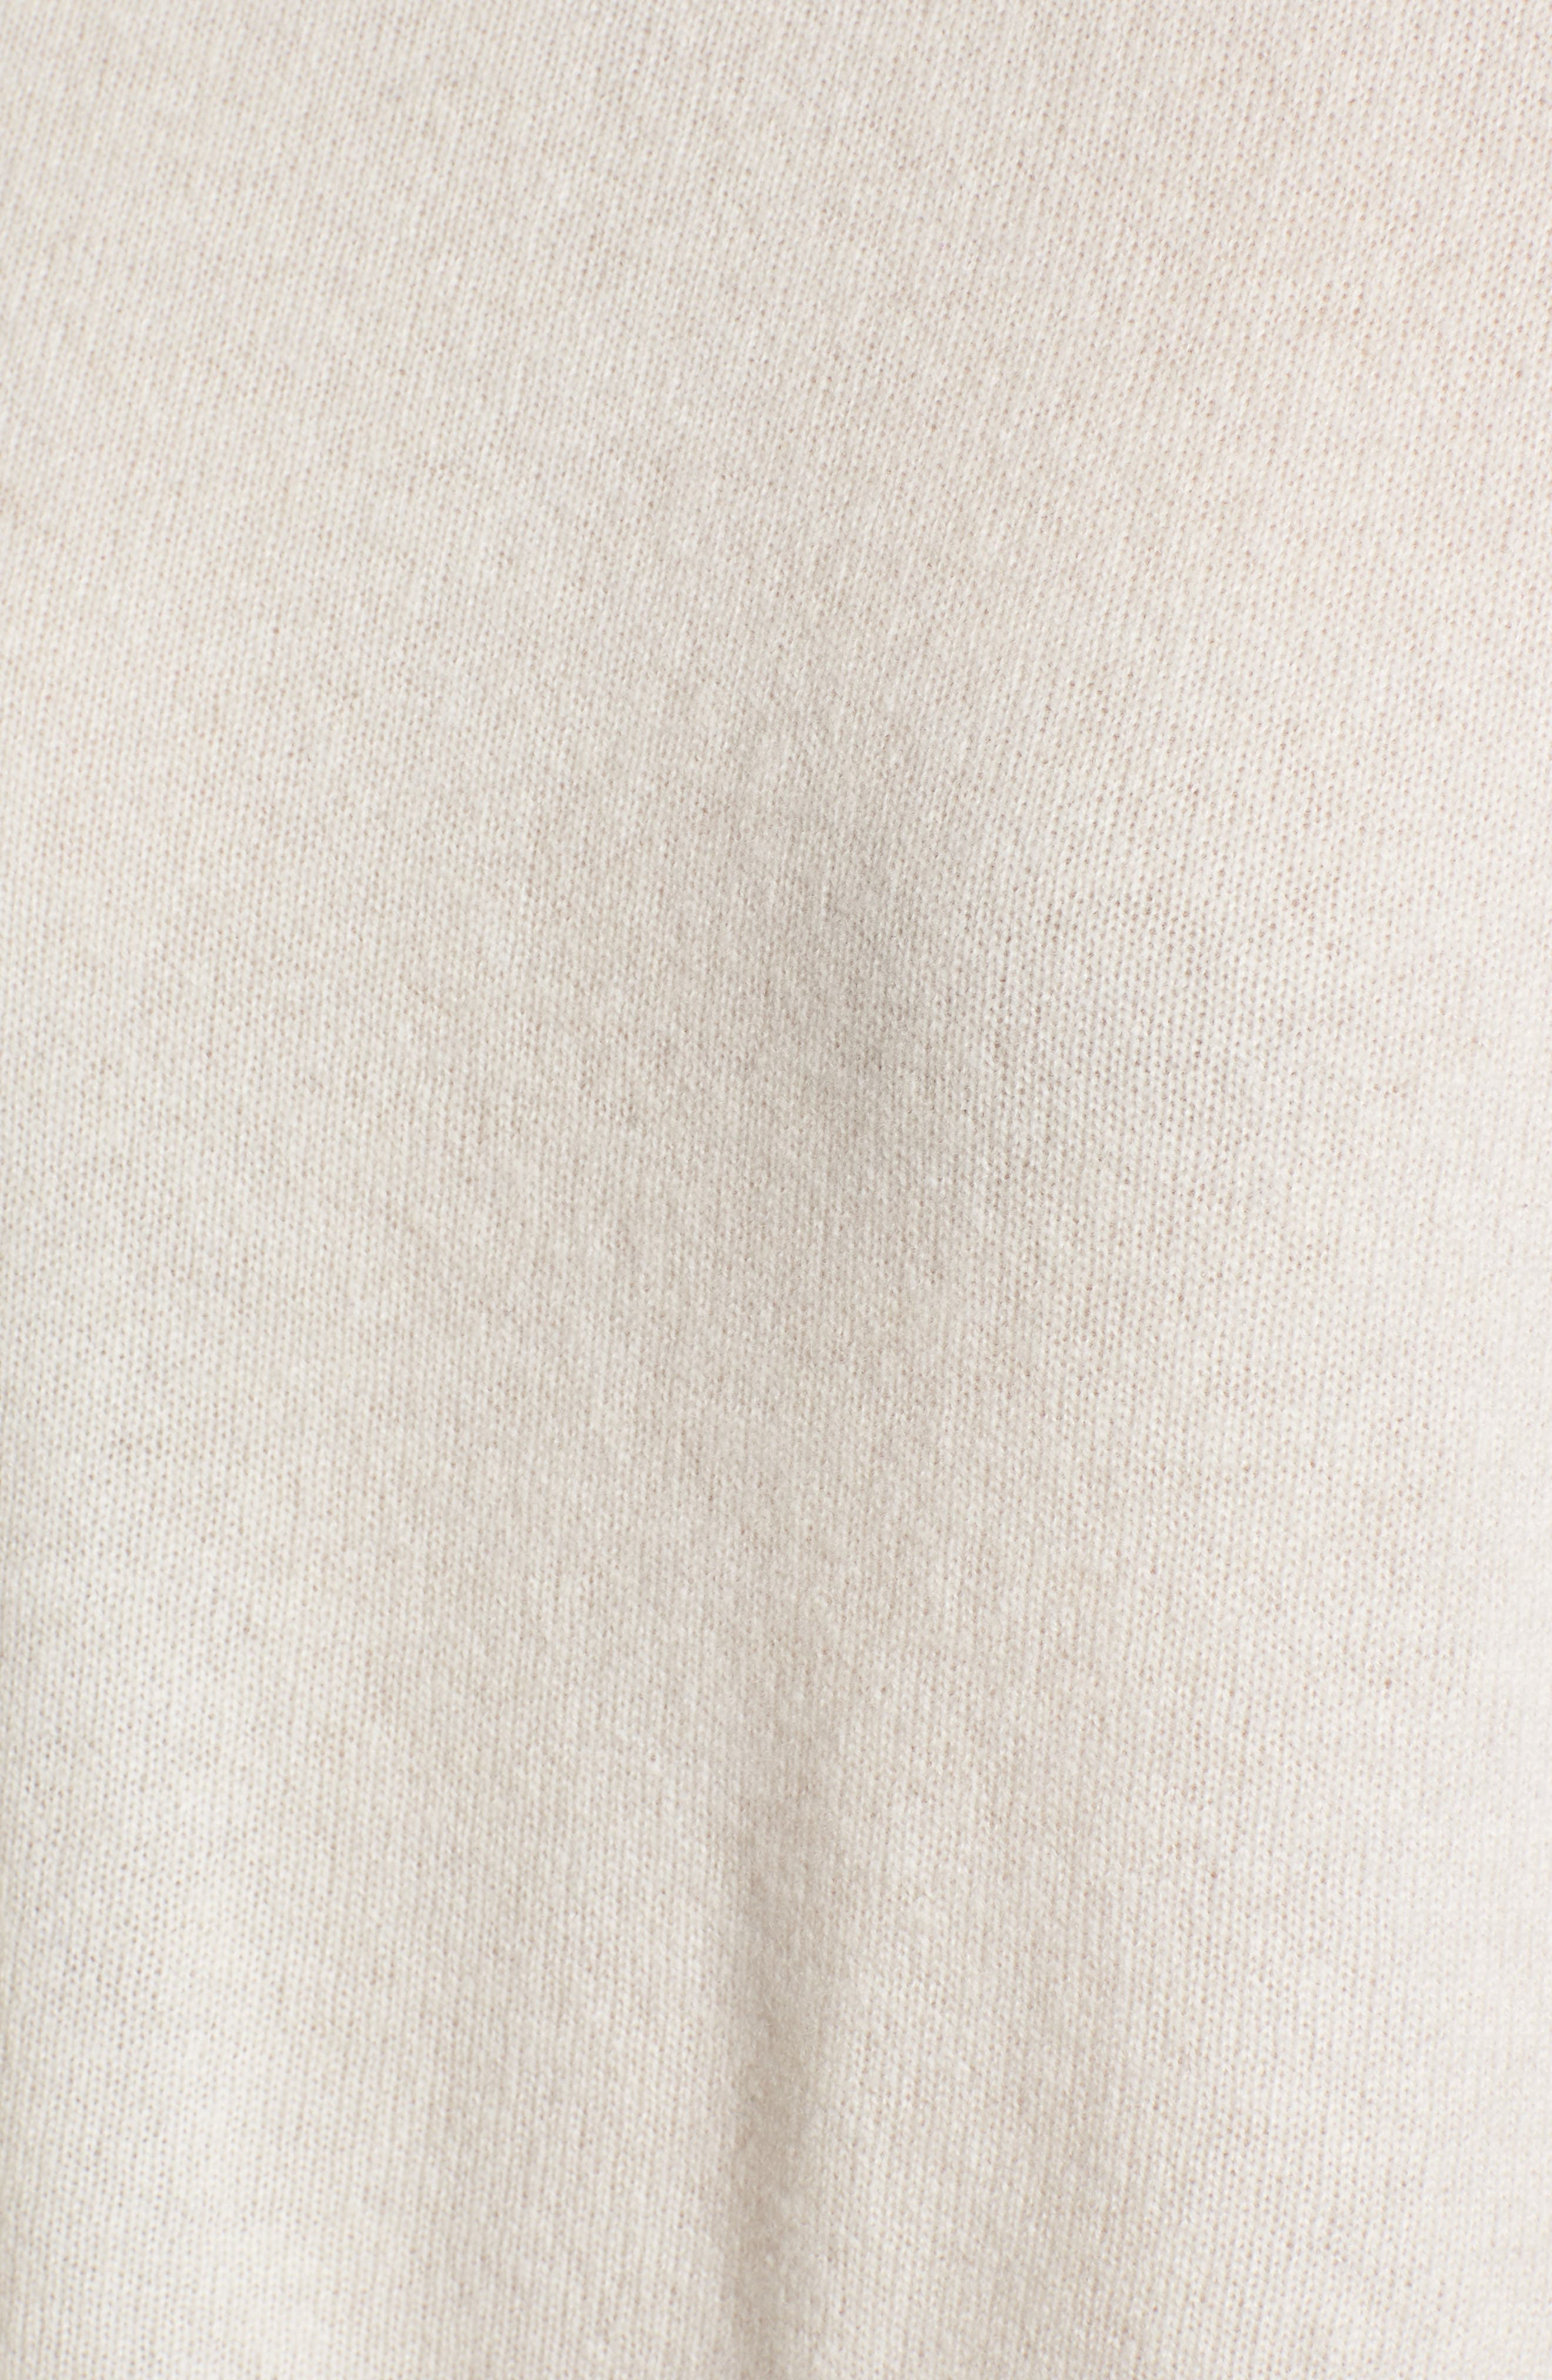 Button Detail Cashmere Sweater,                             Alternate thumbnail 5, color,                             270